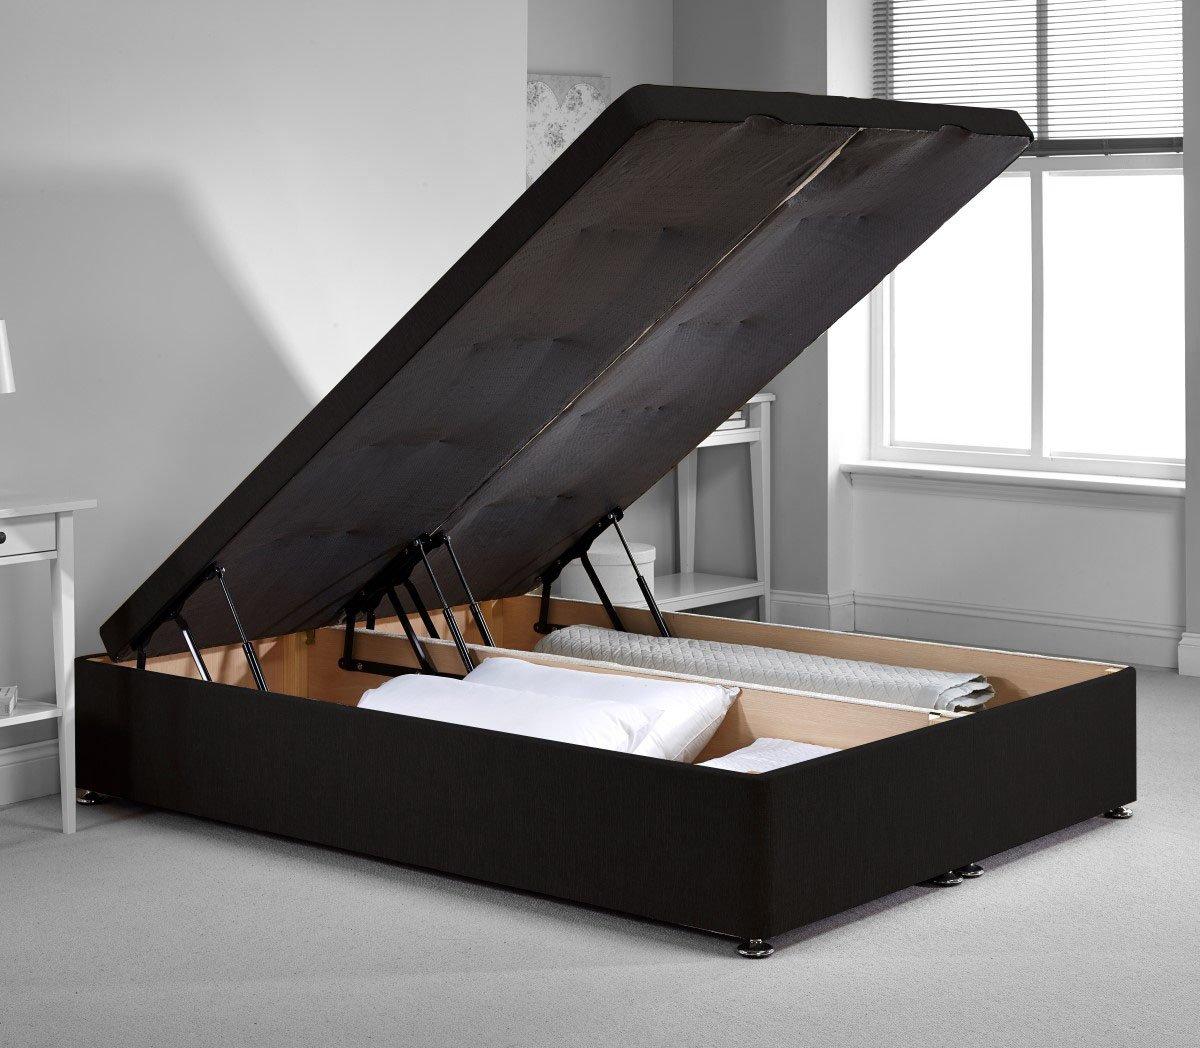 richworth Diván cama otomana marco - negro felpilla tela - Único - 3 ...